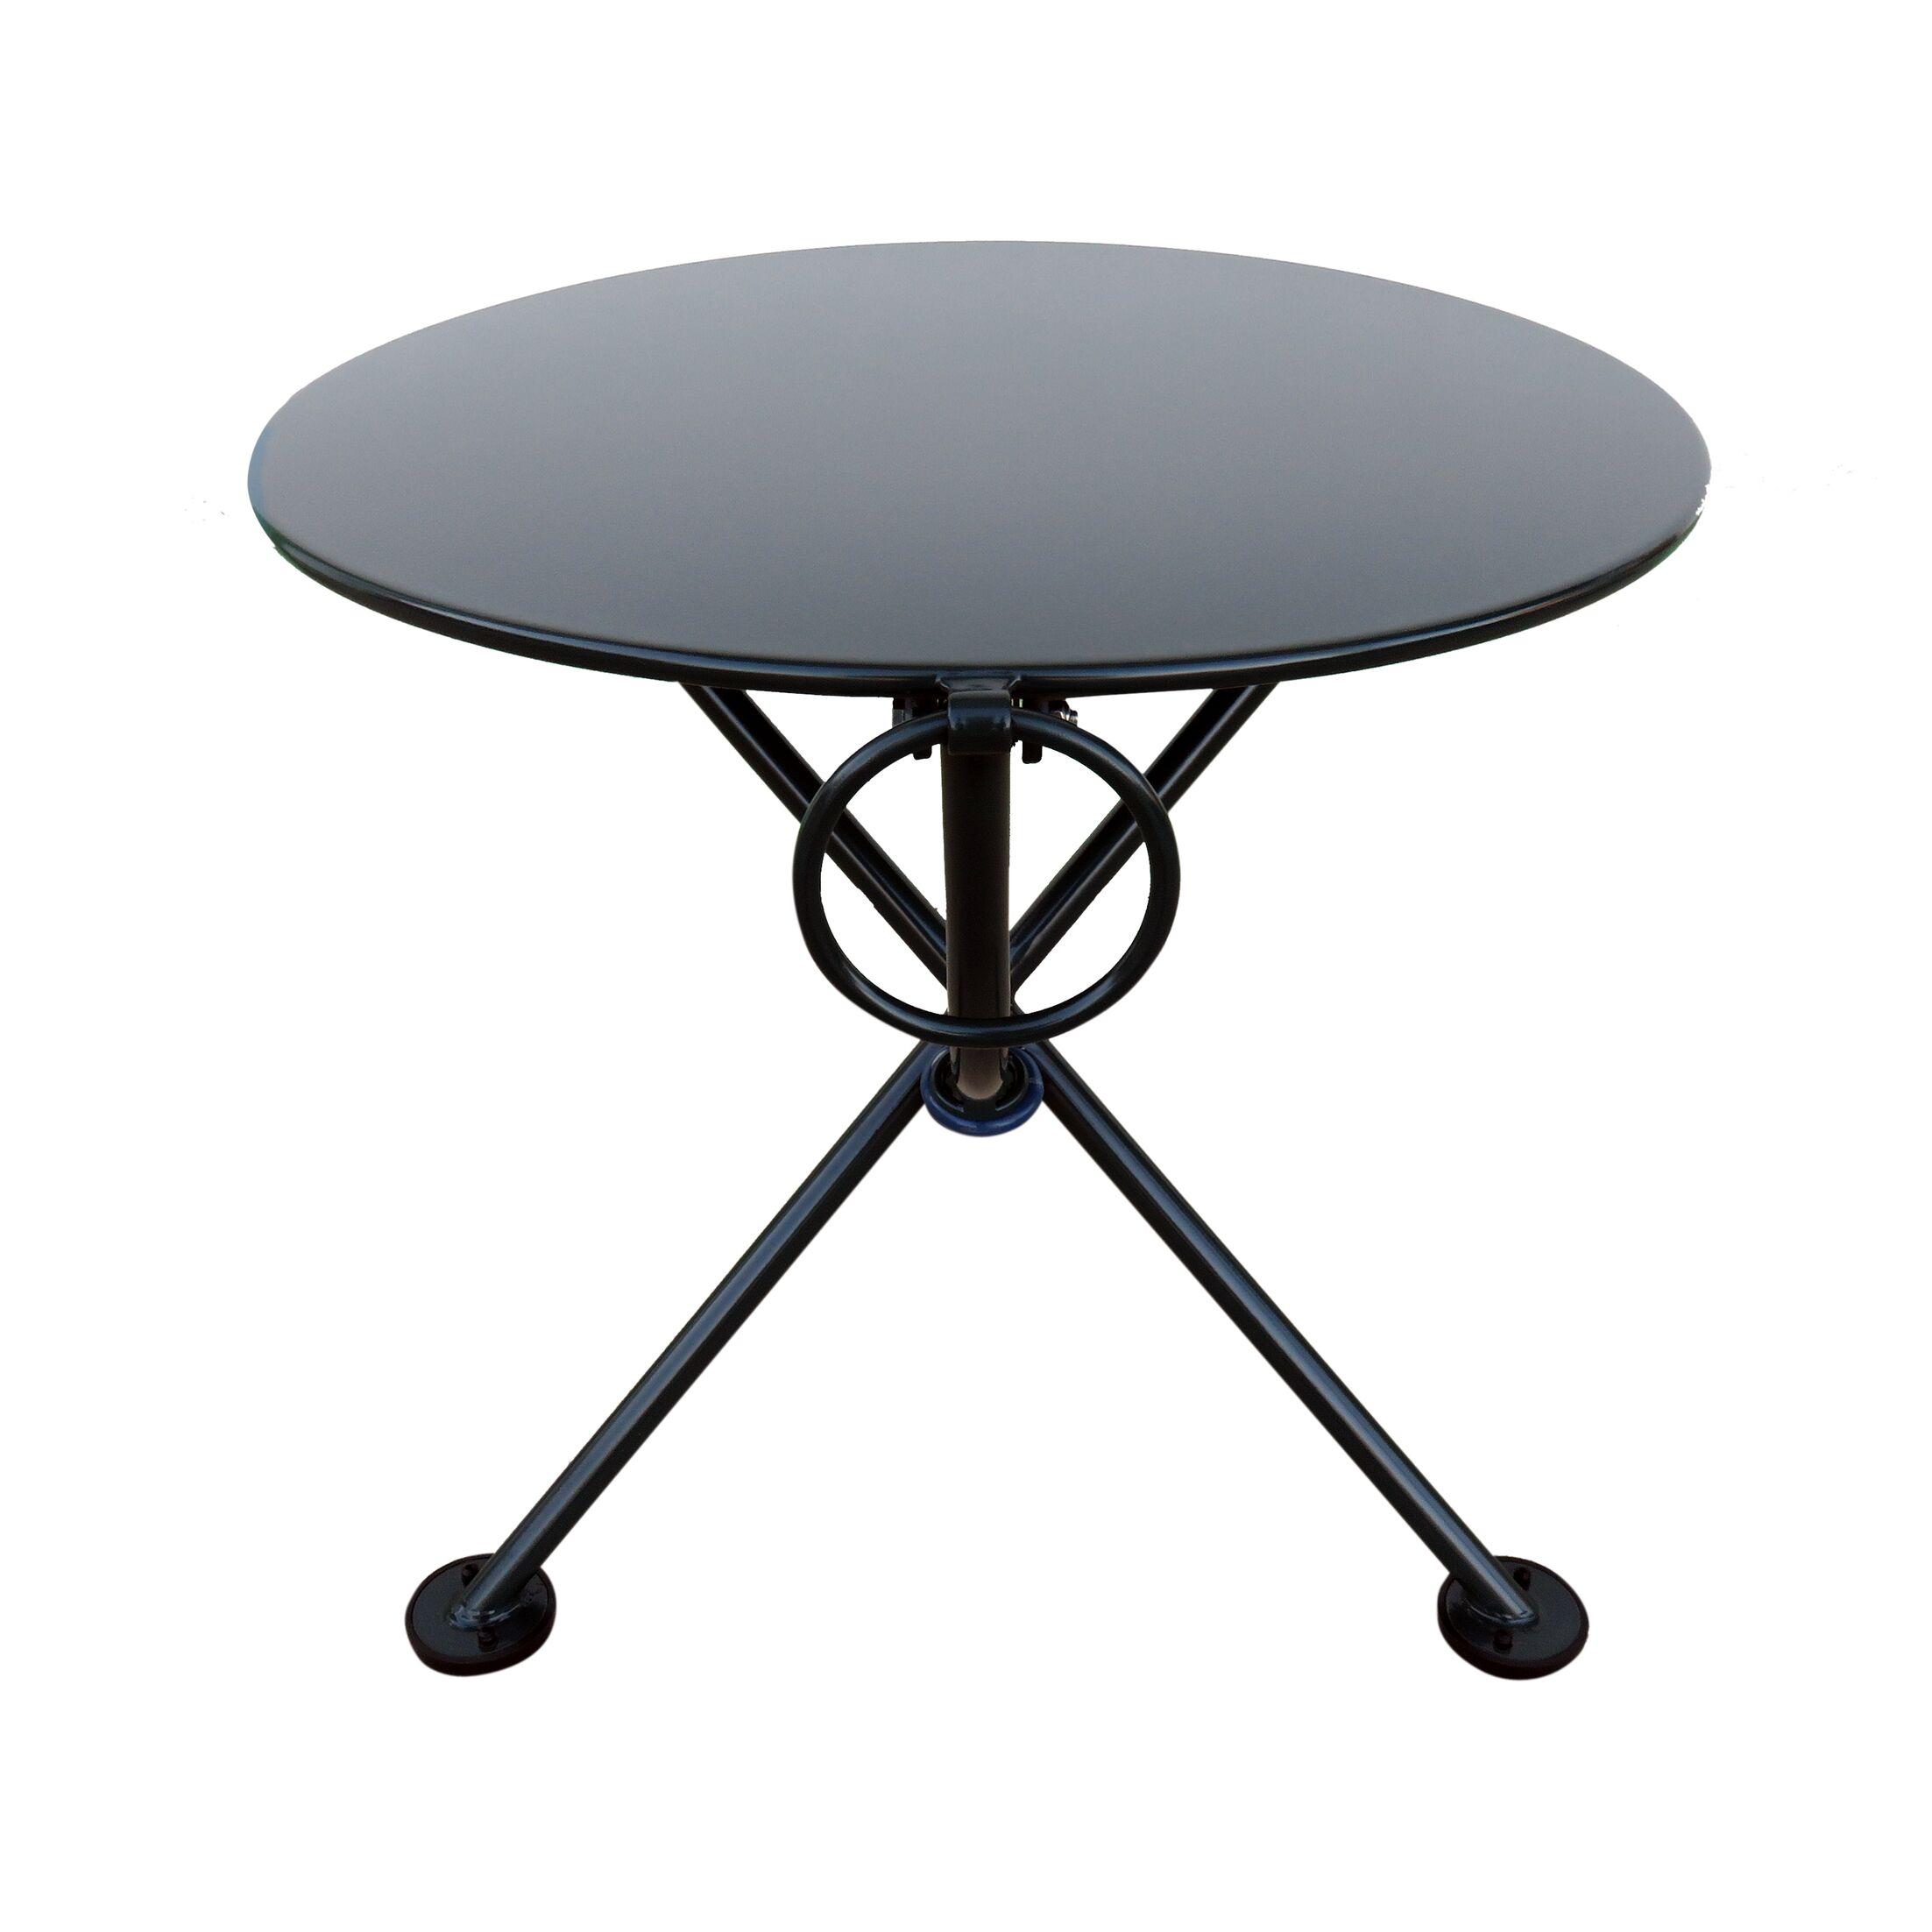 French Caf� Folding Side Table Base Color: Black Green